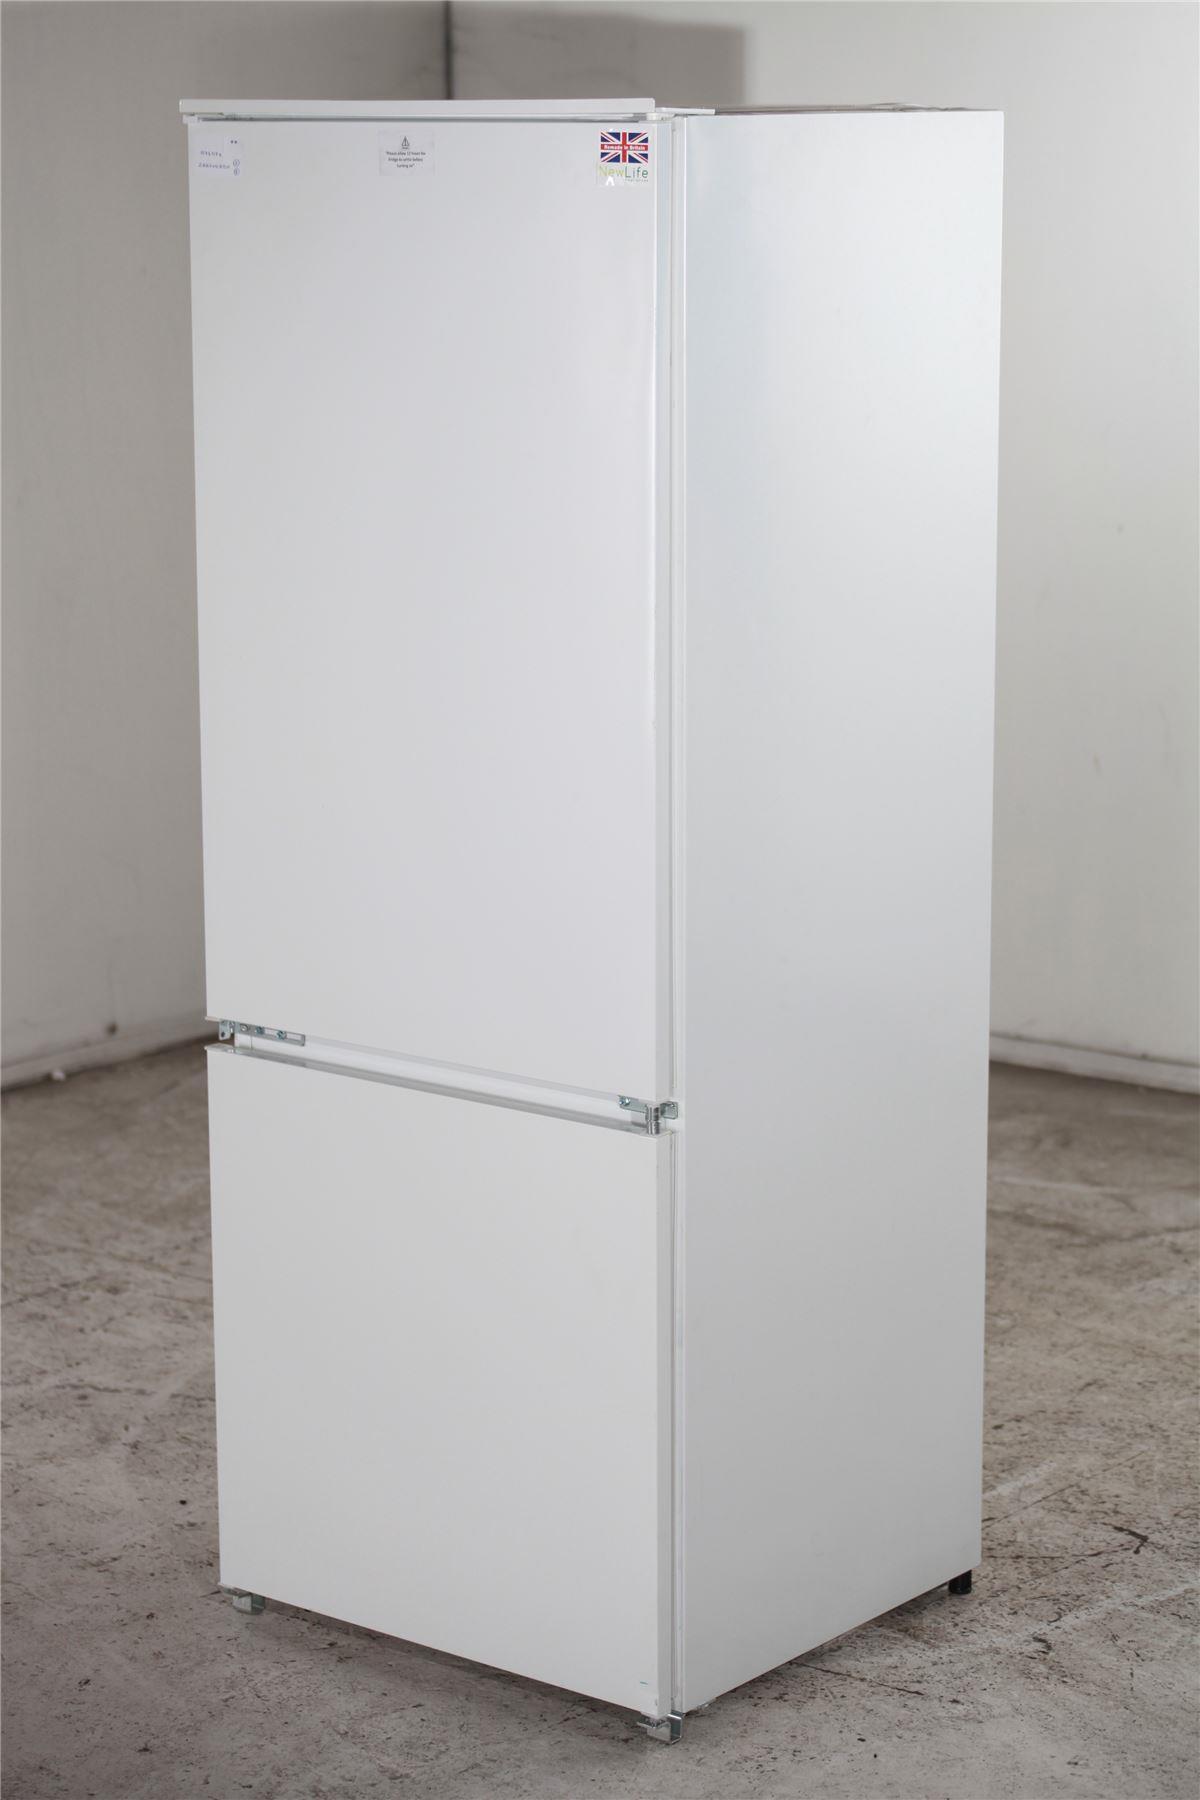 zanussi integrated fridge freezer zbb24430sa white. Black Bedroom Furniture Sets. Home Design Ideas